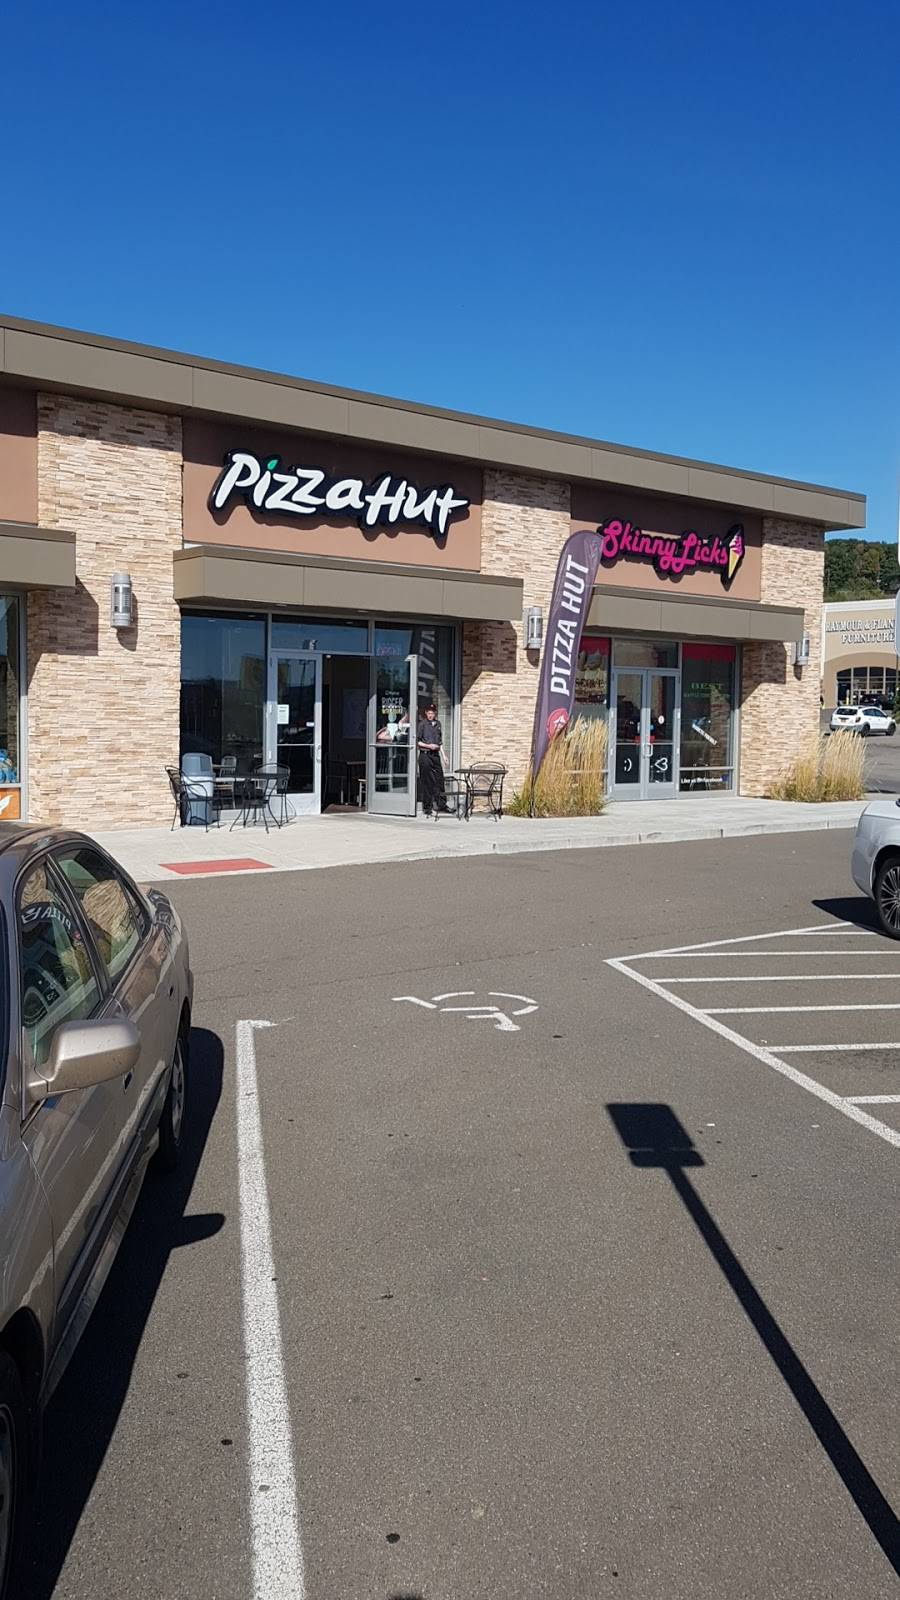 Pizza Hut | restaurant | 218 Reynolds Rd Suite 3, Johnson City, NY 13790, USA | 6077987527 OR +1 607-798-7527